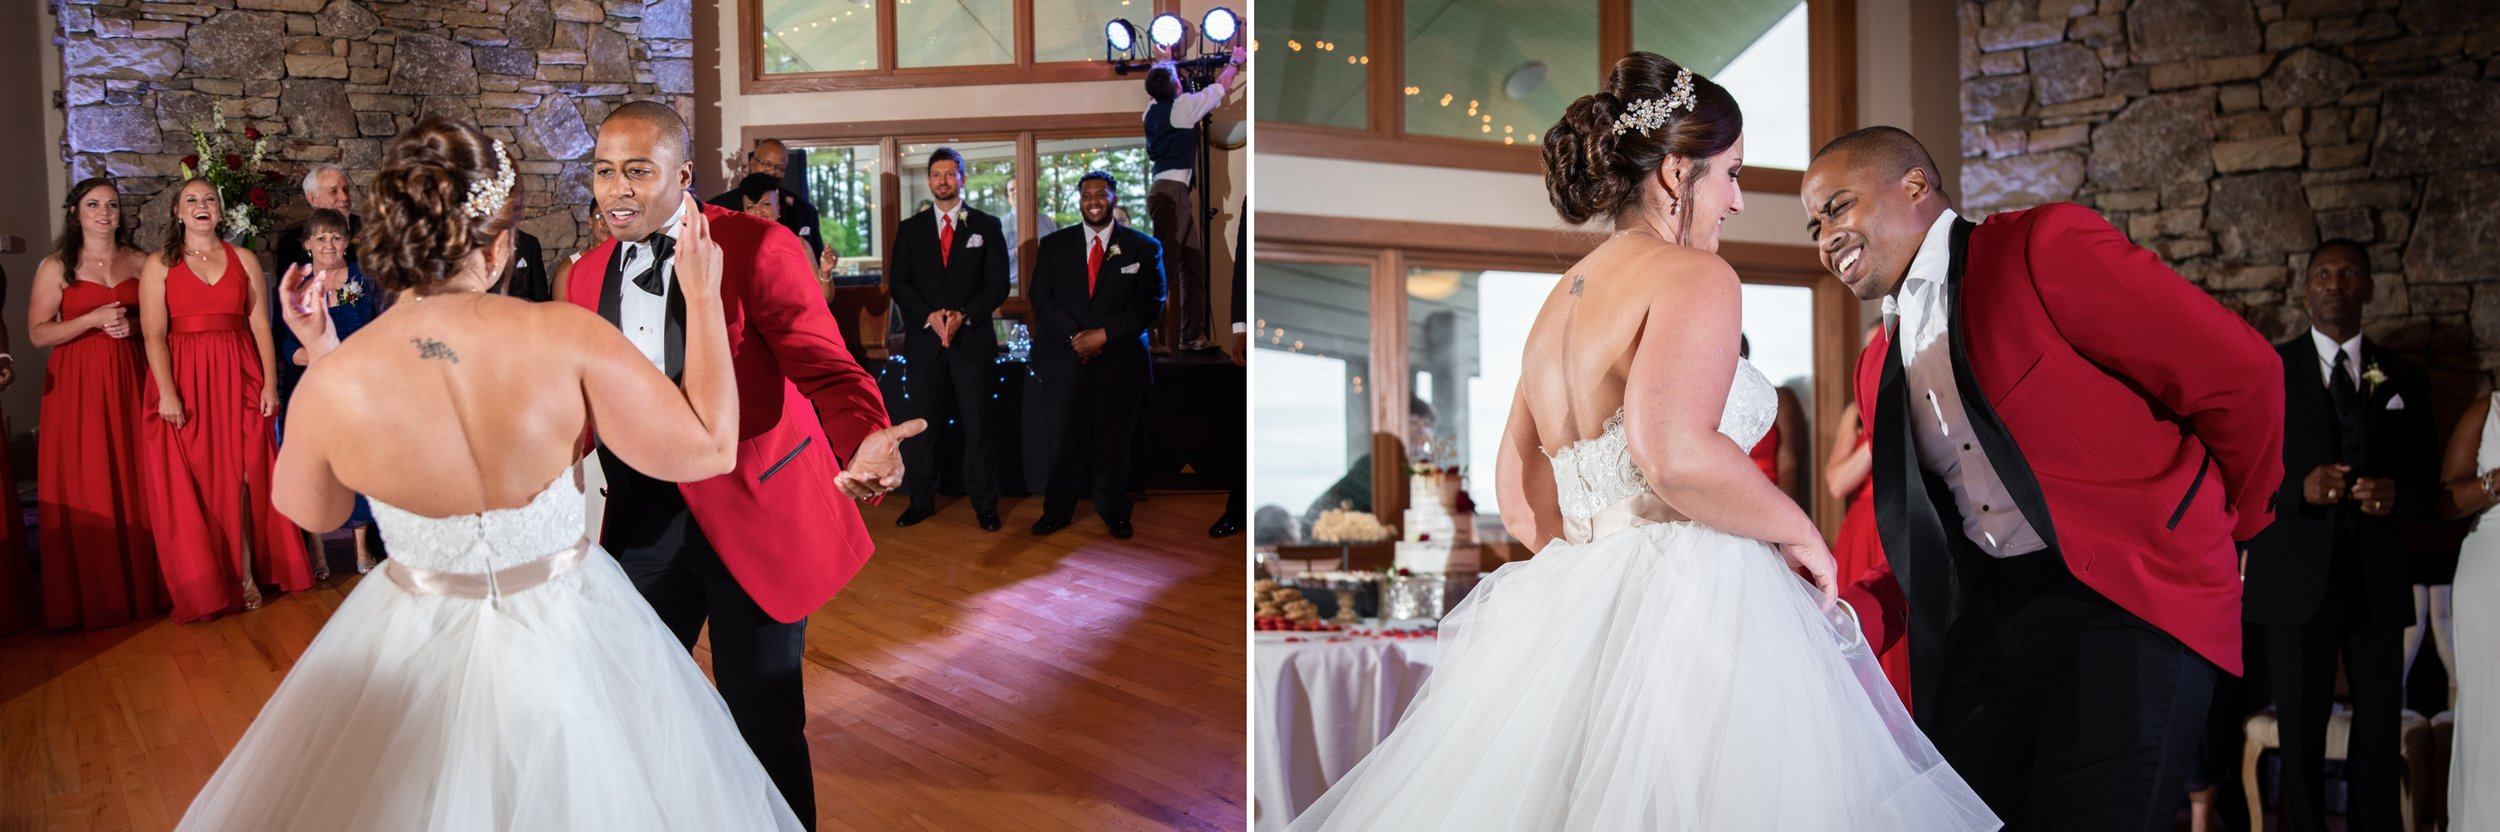 High Vista Weddings - Asheville Wedding 2 45.jpg